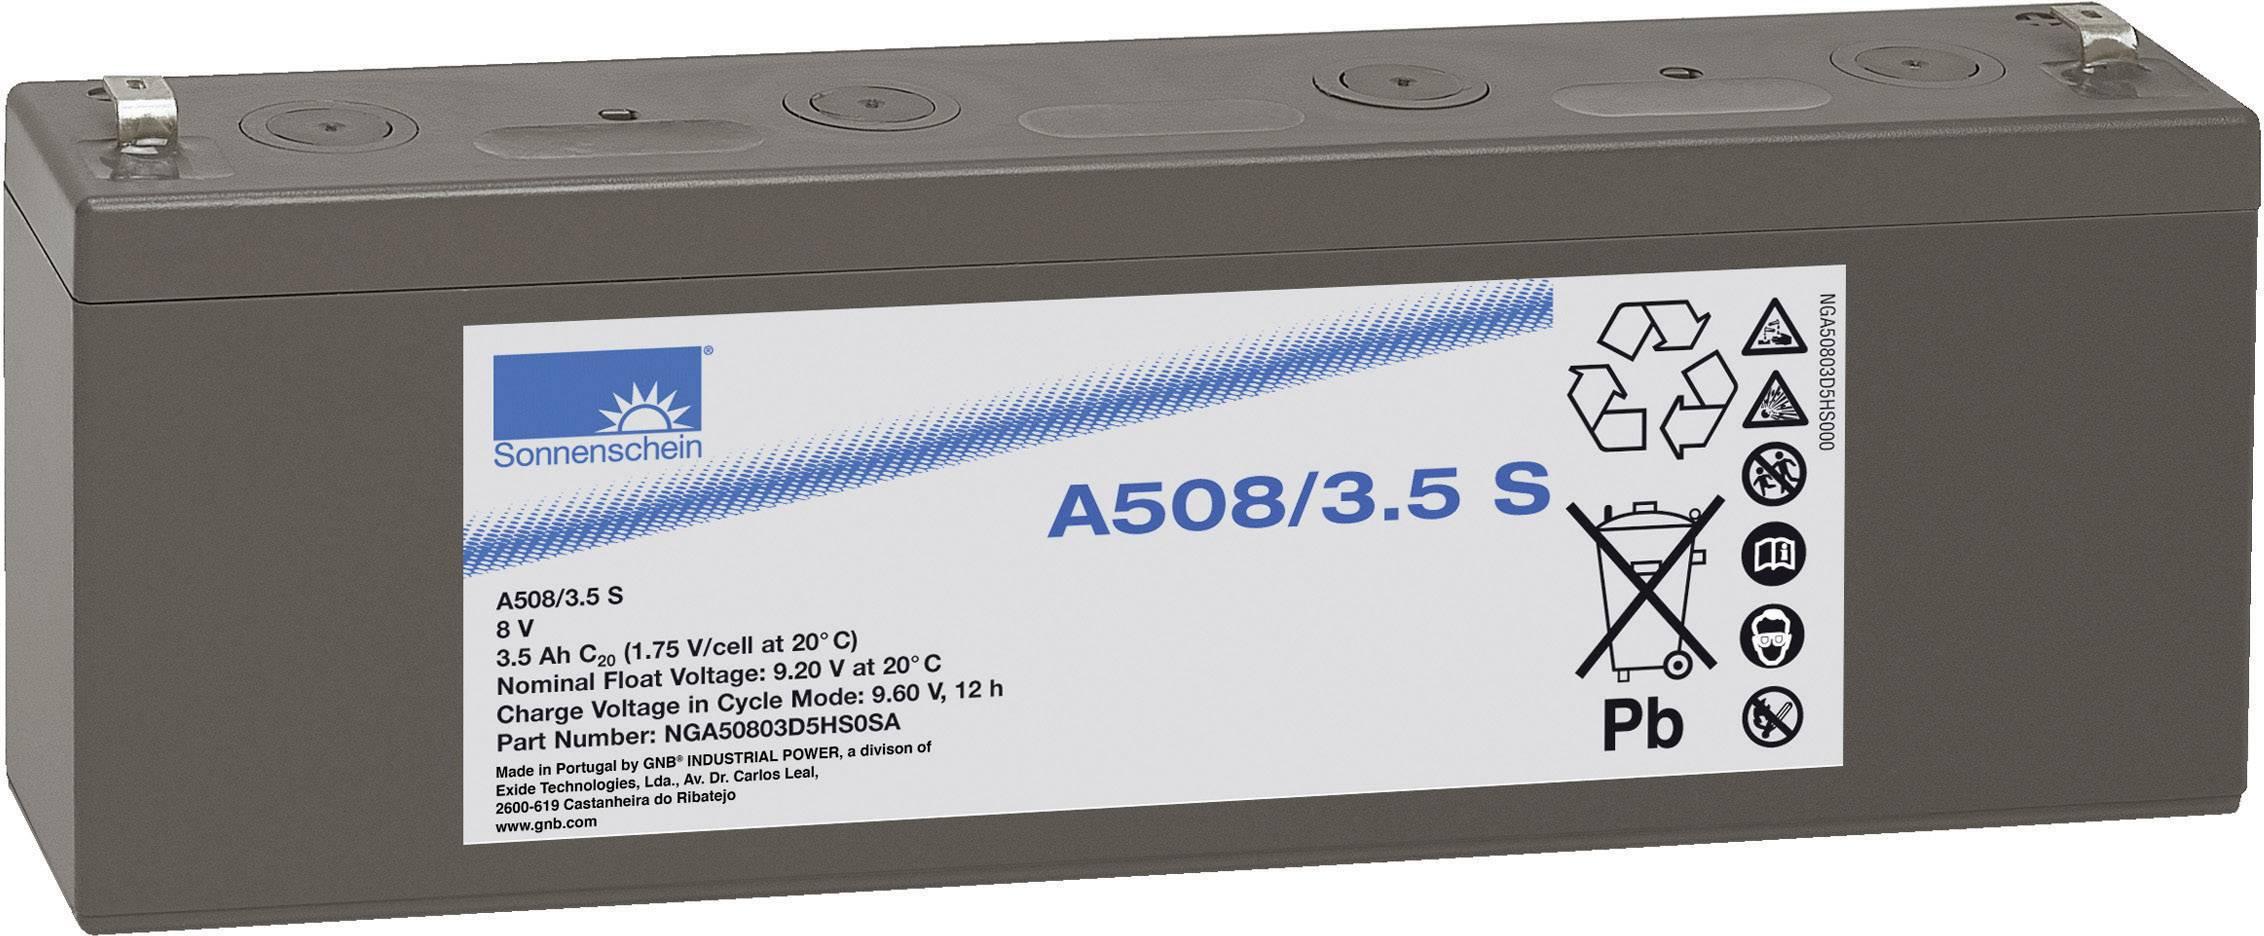 Olovený akumulátor GNB Sonnenschein A508/3,5 S NGA50803D5HS0SA, 3.5 Ah, 8 V